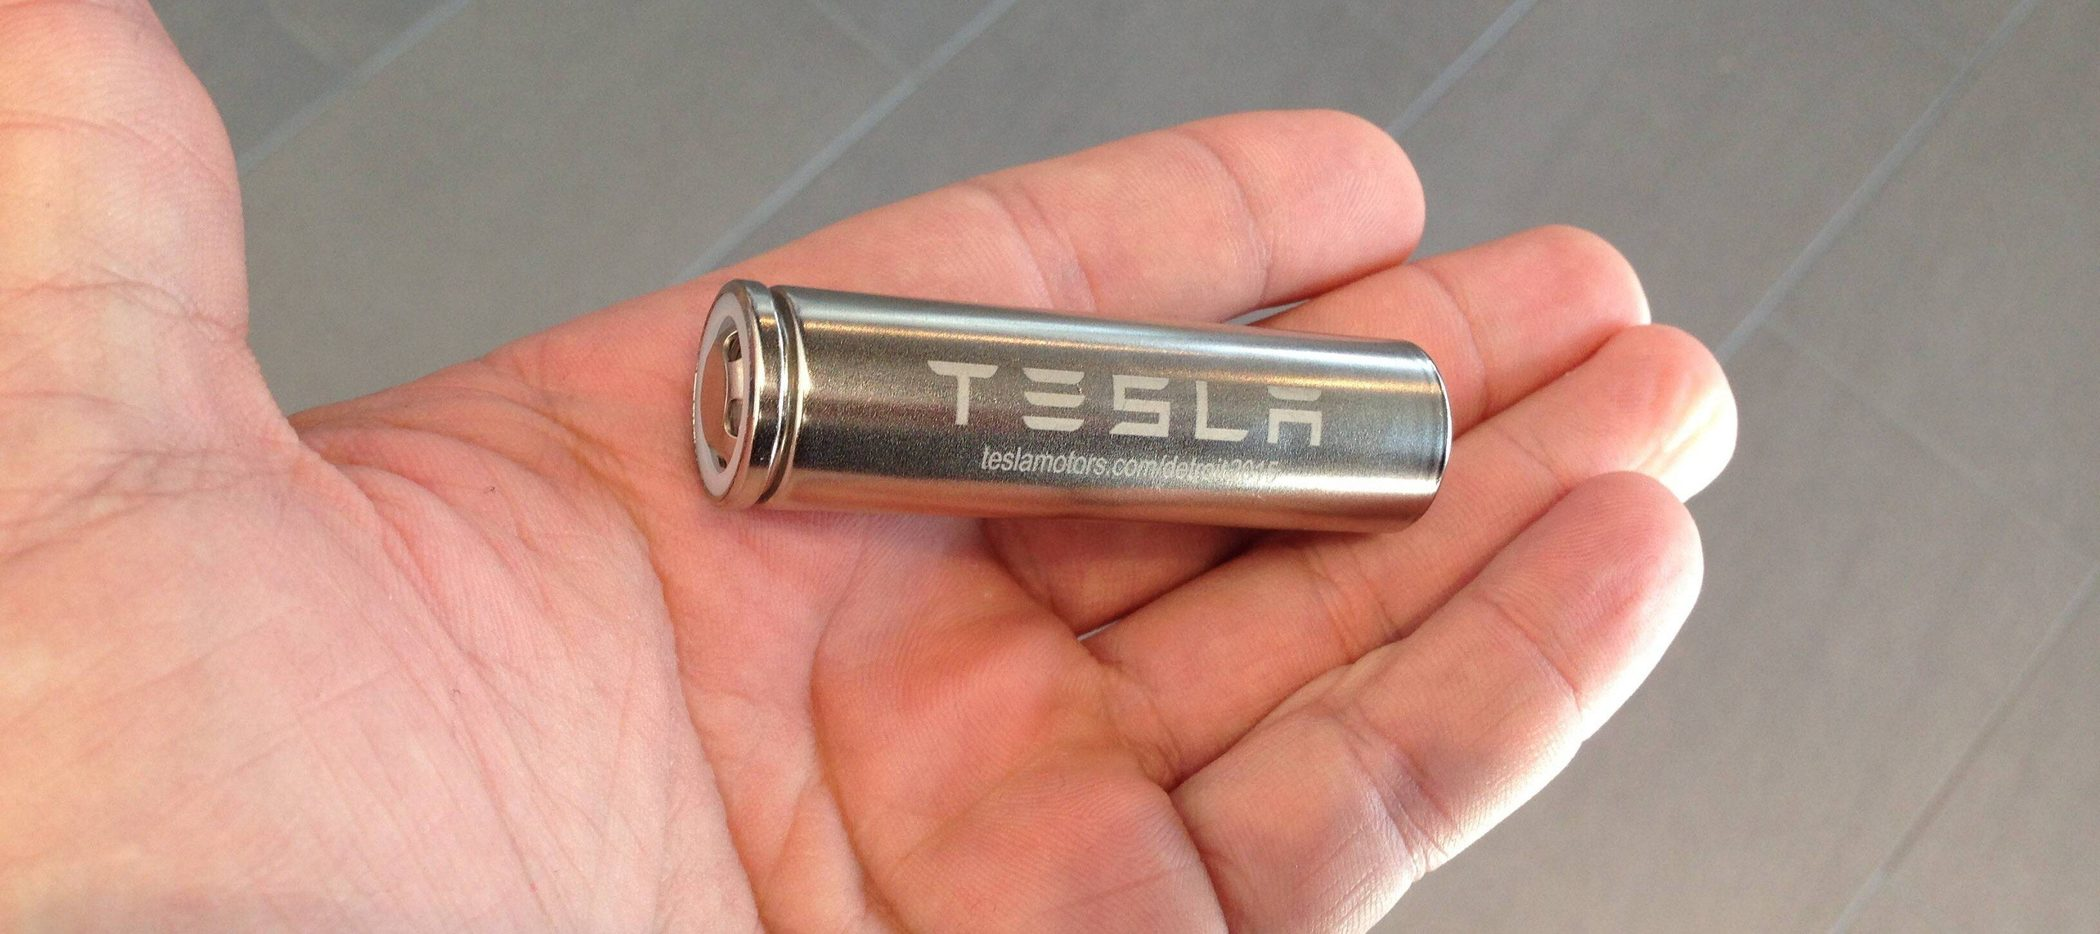 <b>特斯拉Model 3在5月份用了全球1/6的电动车电池</b>